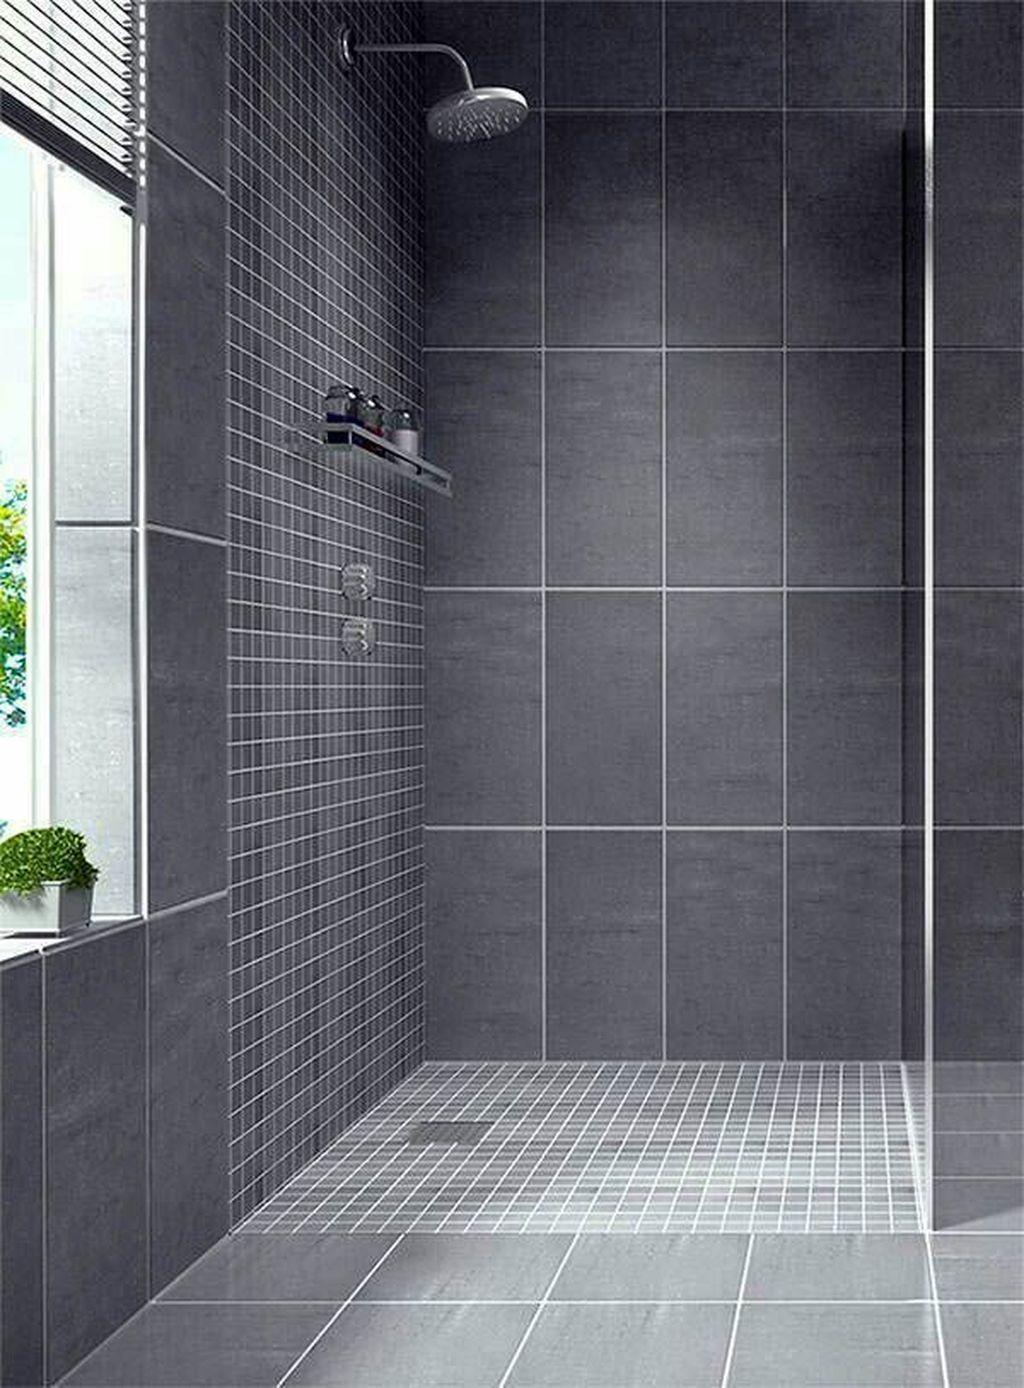 34 Lovely Bathroom Ceramic Tile Ideas You Should Copy Gray Shower Tile Bathroom Accessories Sets Tiles